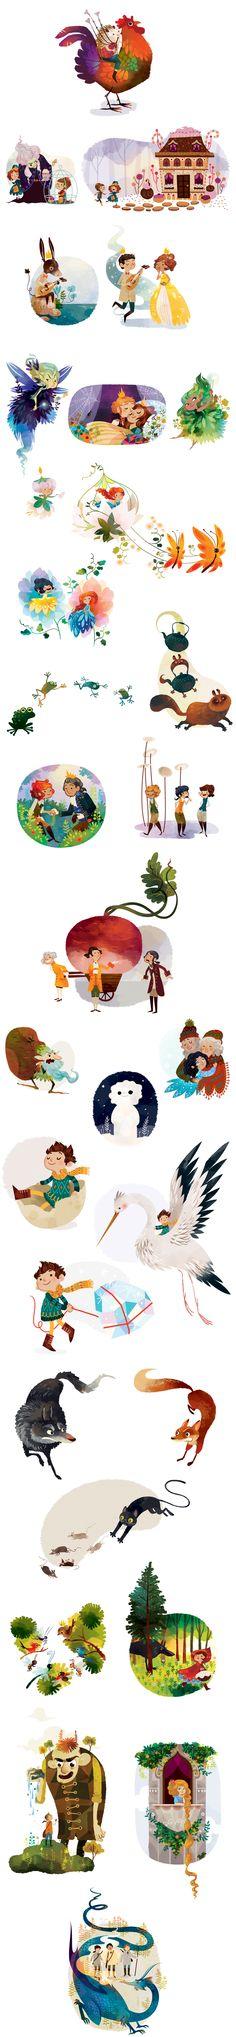 Fairy Tales by Lorena Gomez Alvarez • great illustration vignettes